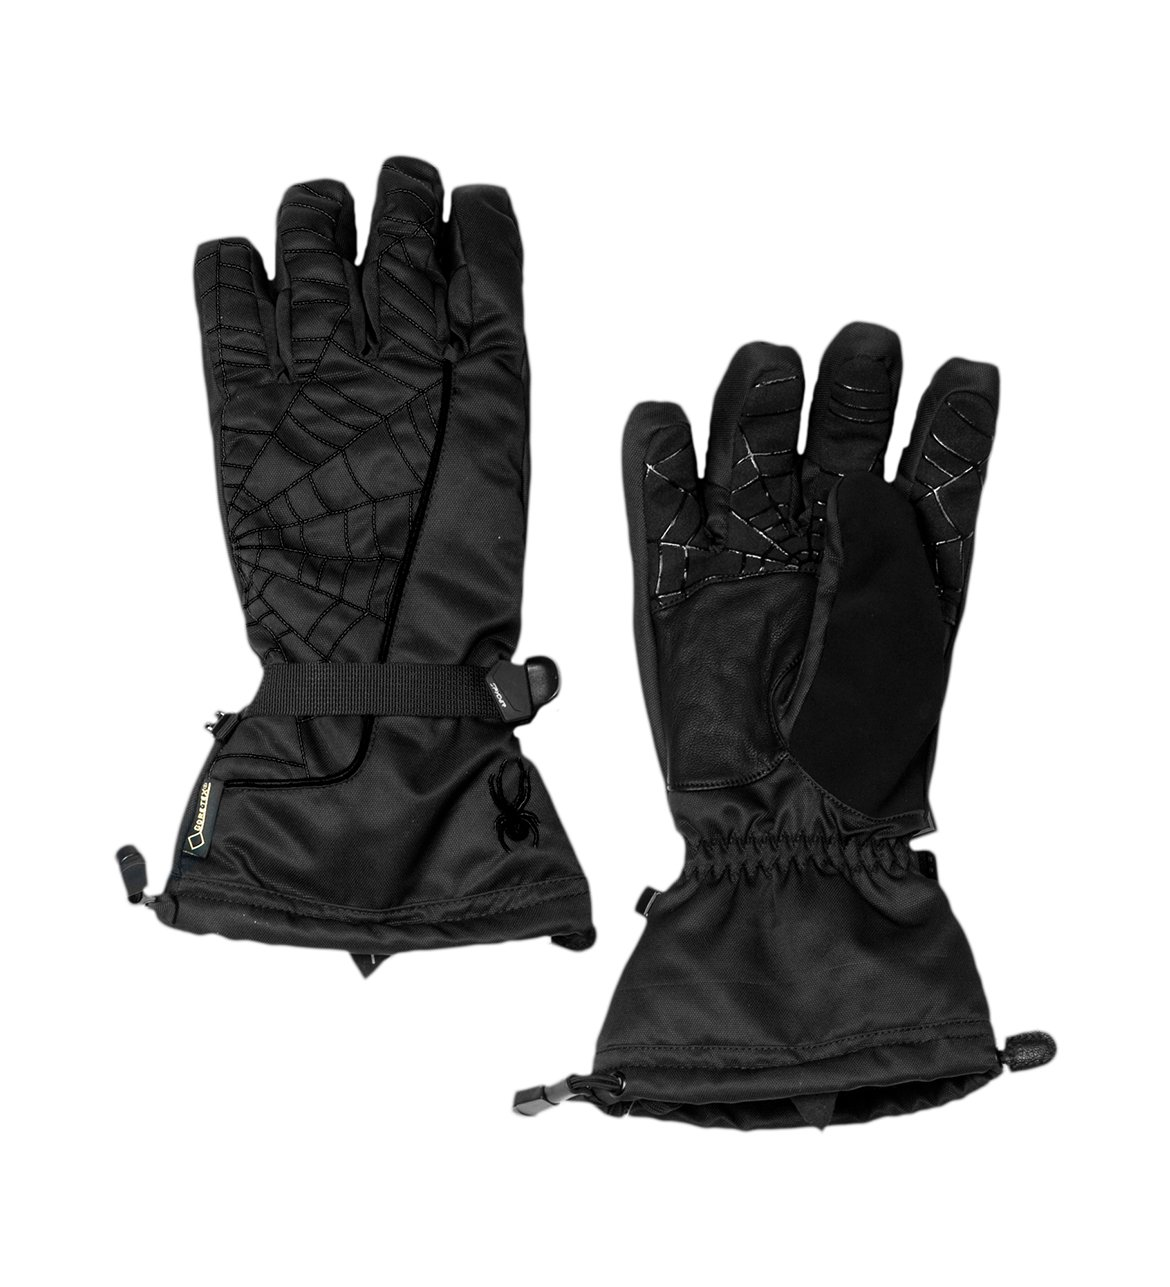 Spyder Men's Overweb Gore-Tex Glove, Black/Black, X-Small